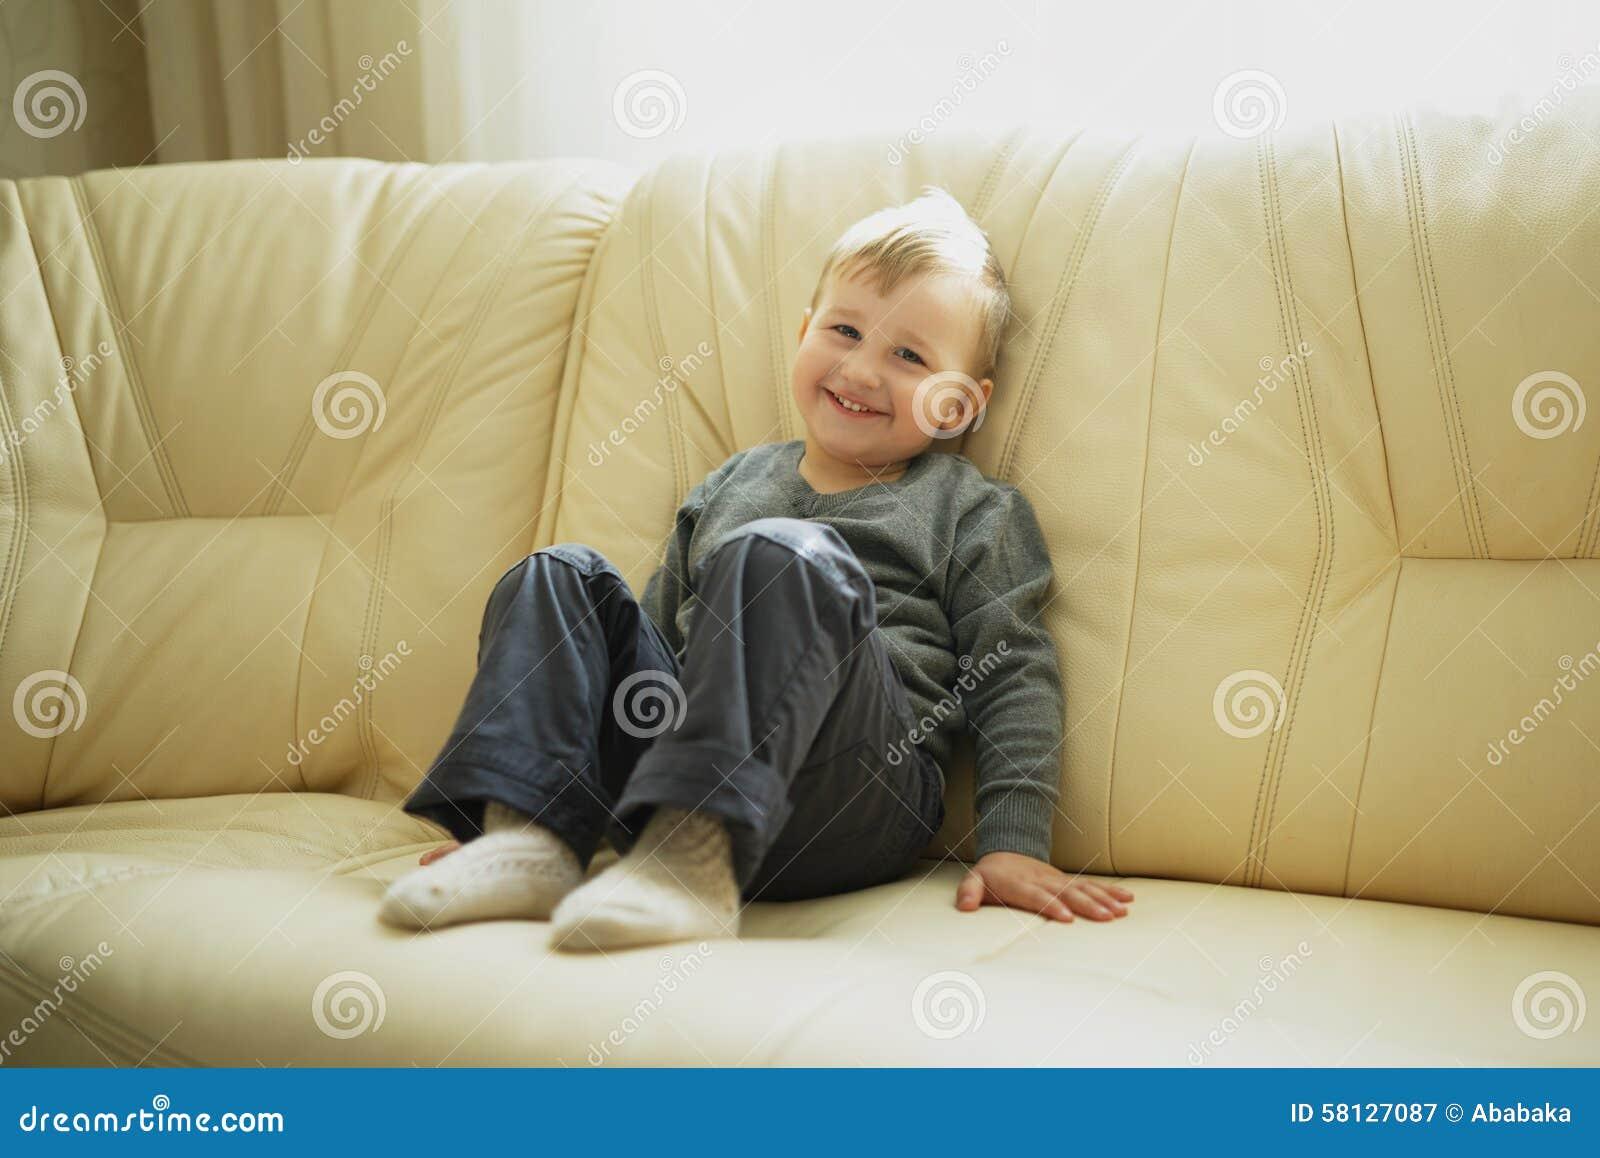 little boy sitting on couch stock image image 58127087. Black Bedroom Furniture Sets. Home Design Ideas